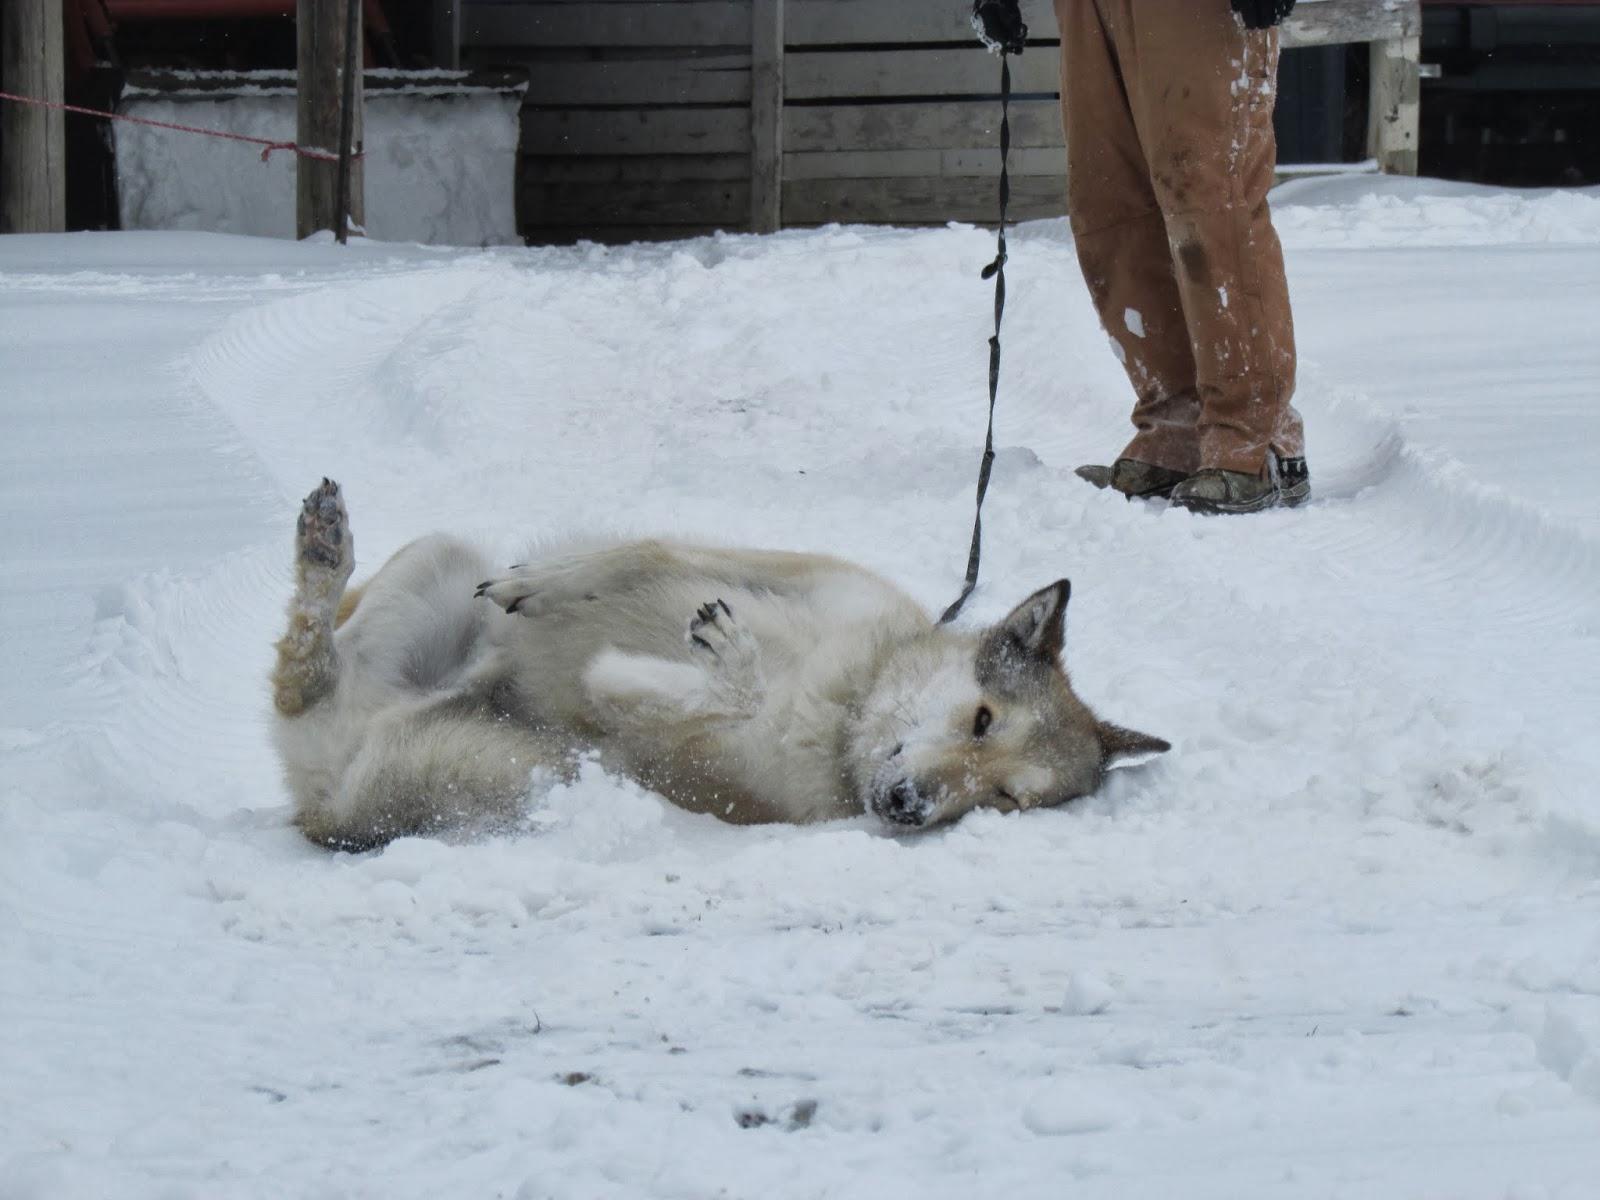 wolfdog, wolf dog, wolf hybrid, wolf dog hybrid